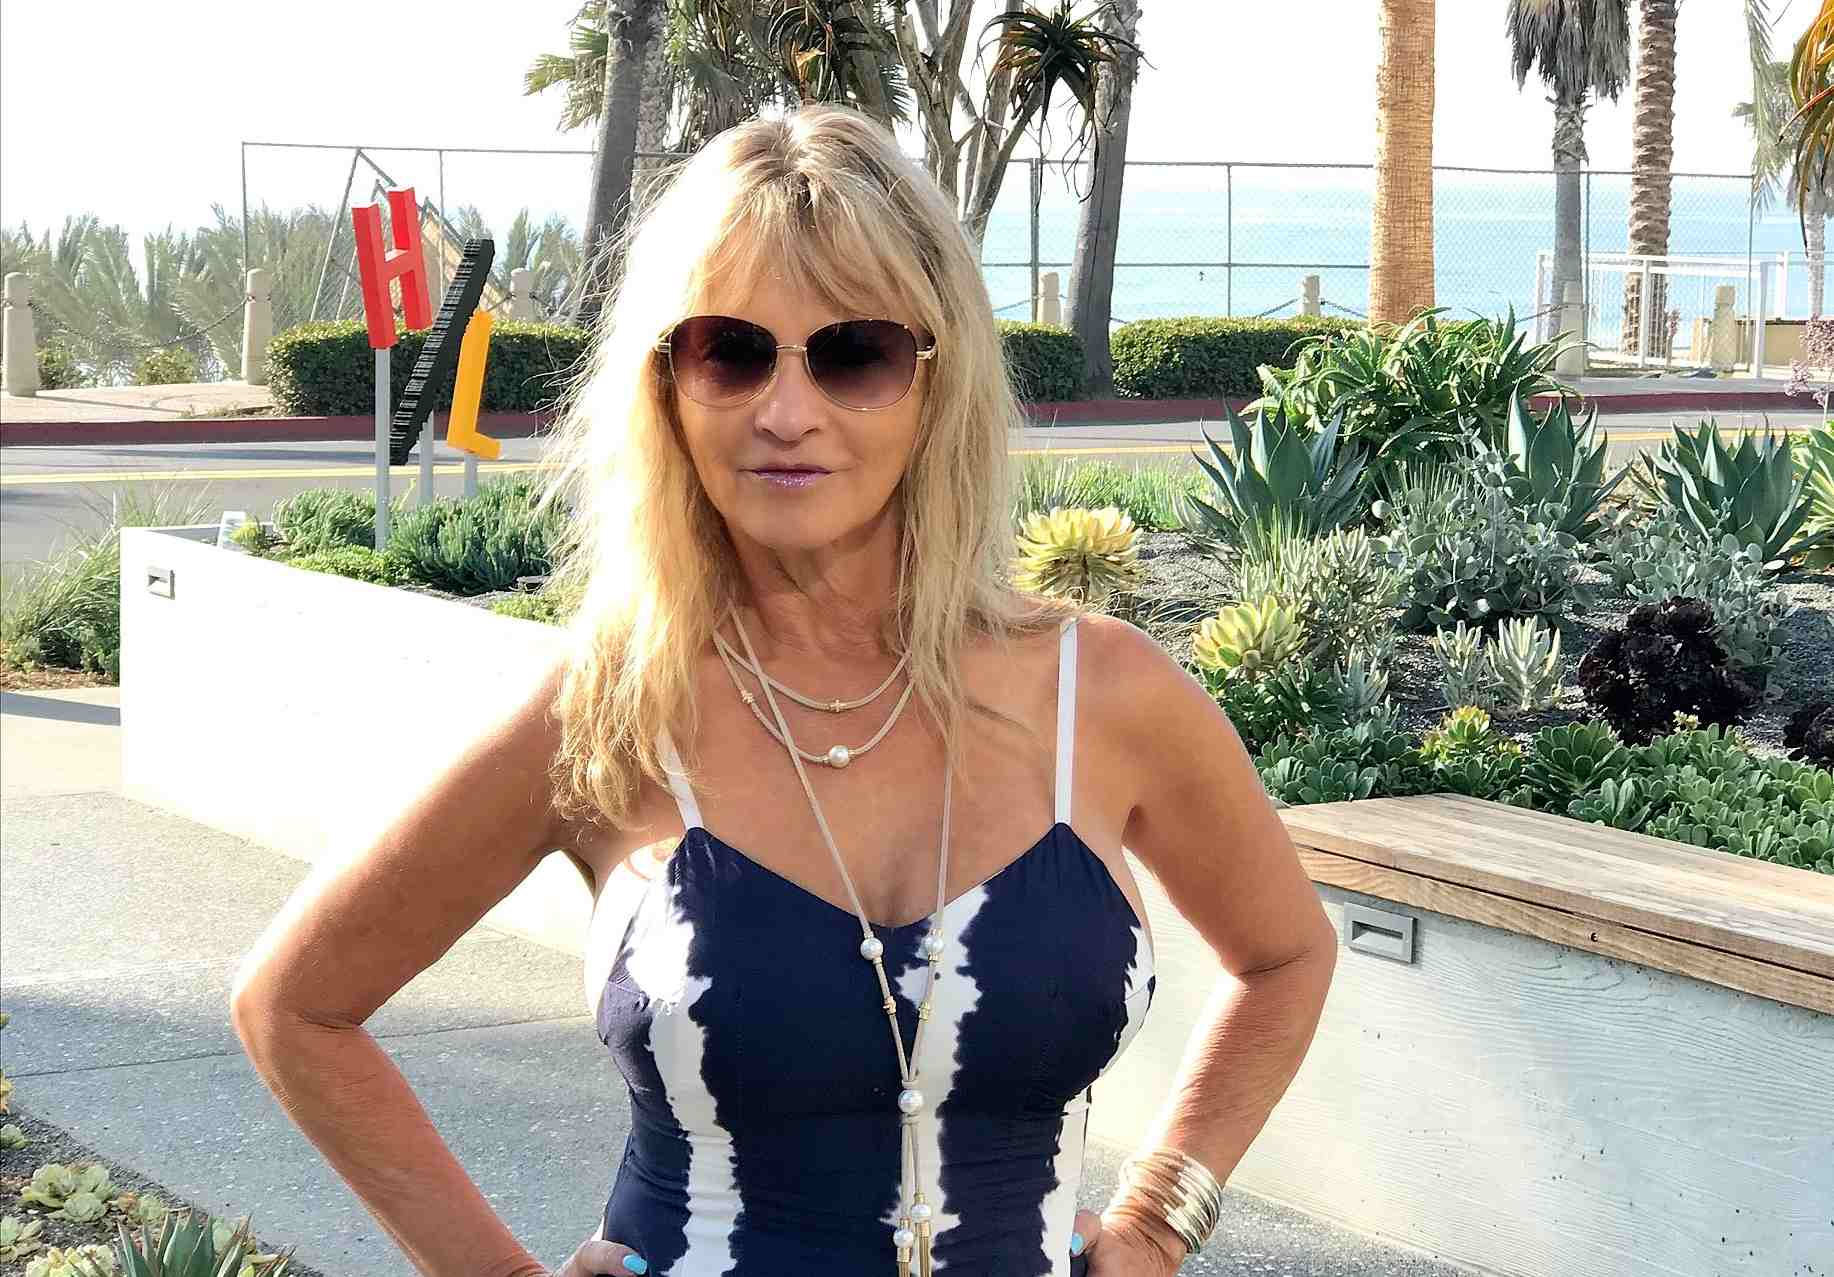 Super hot women wearing a navy blue and white maxi dress Heather Winfield